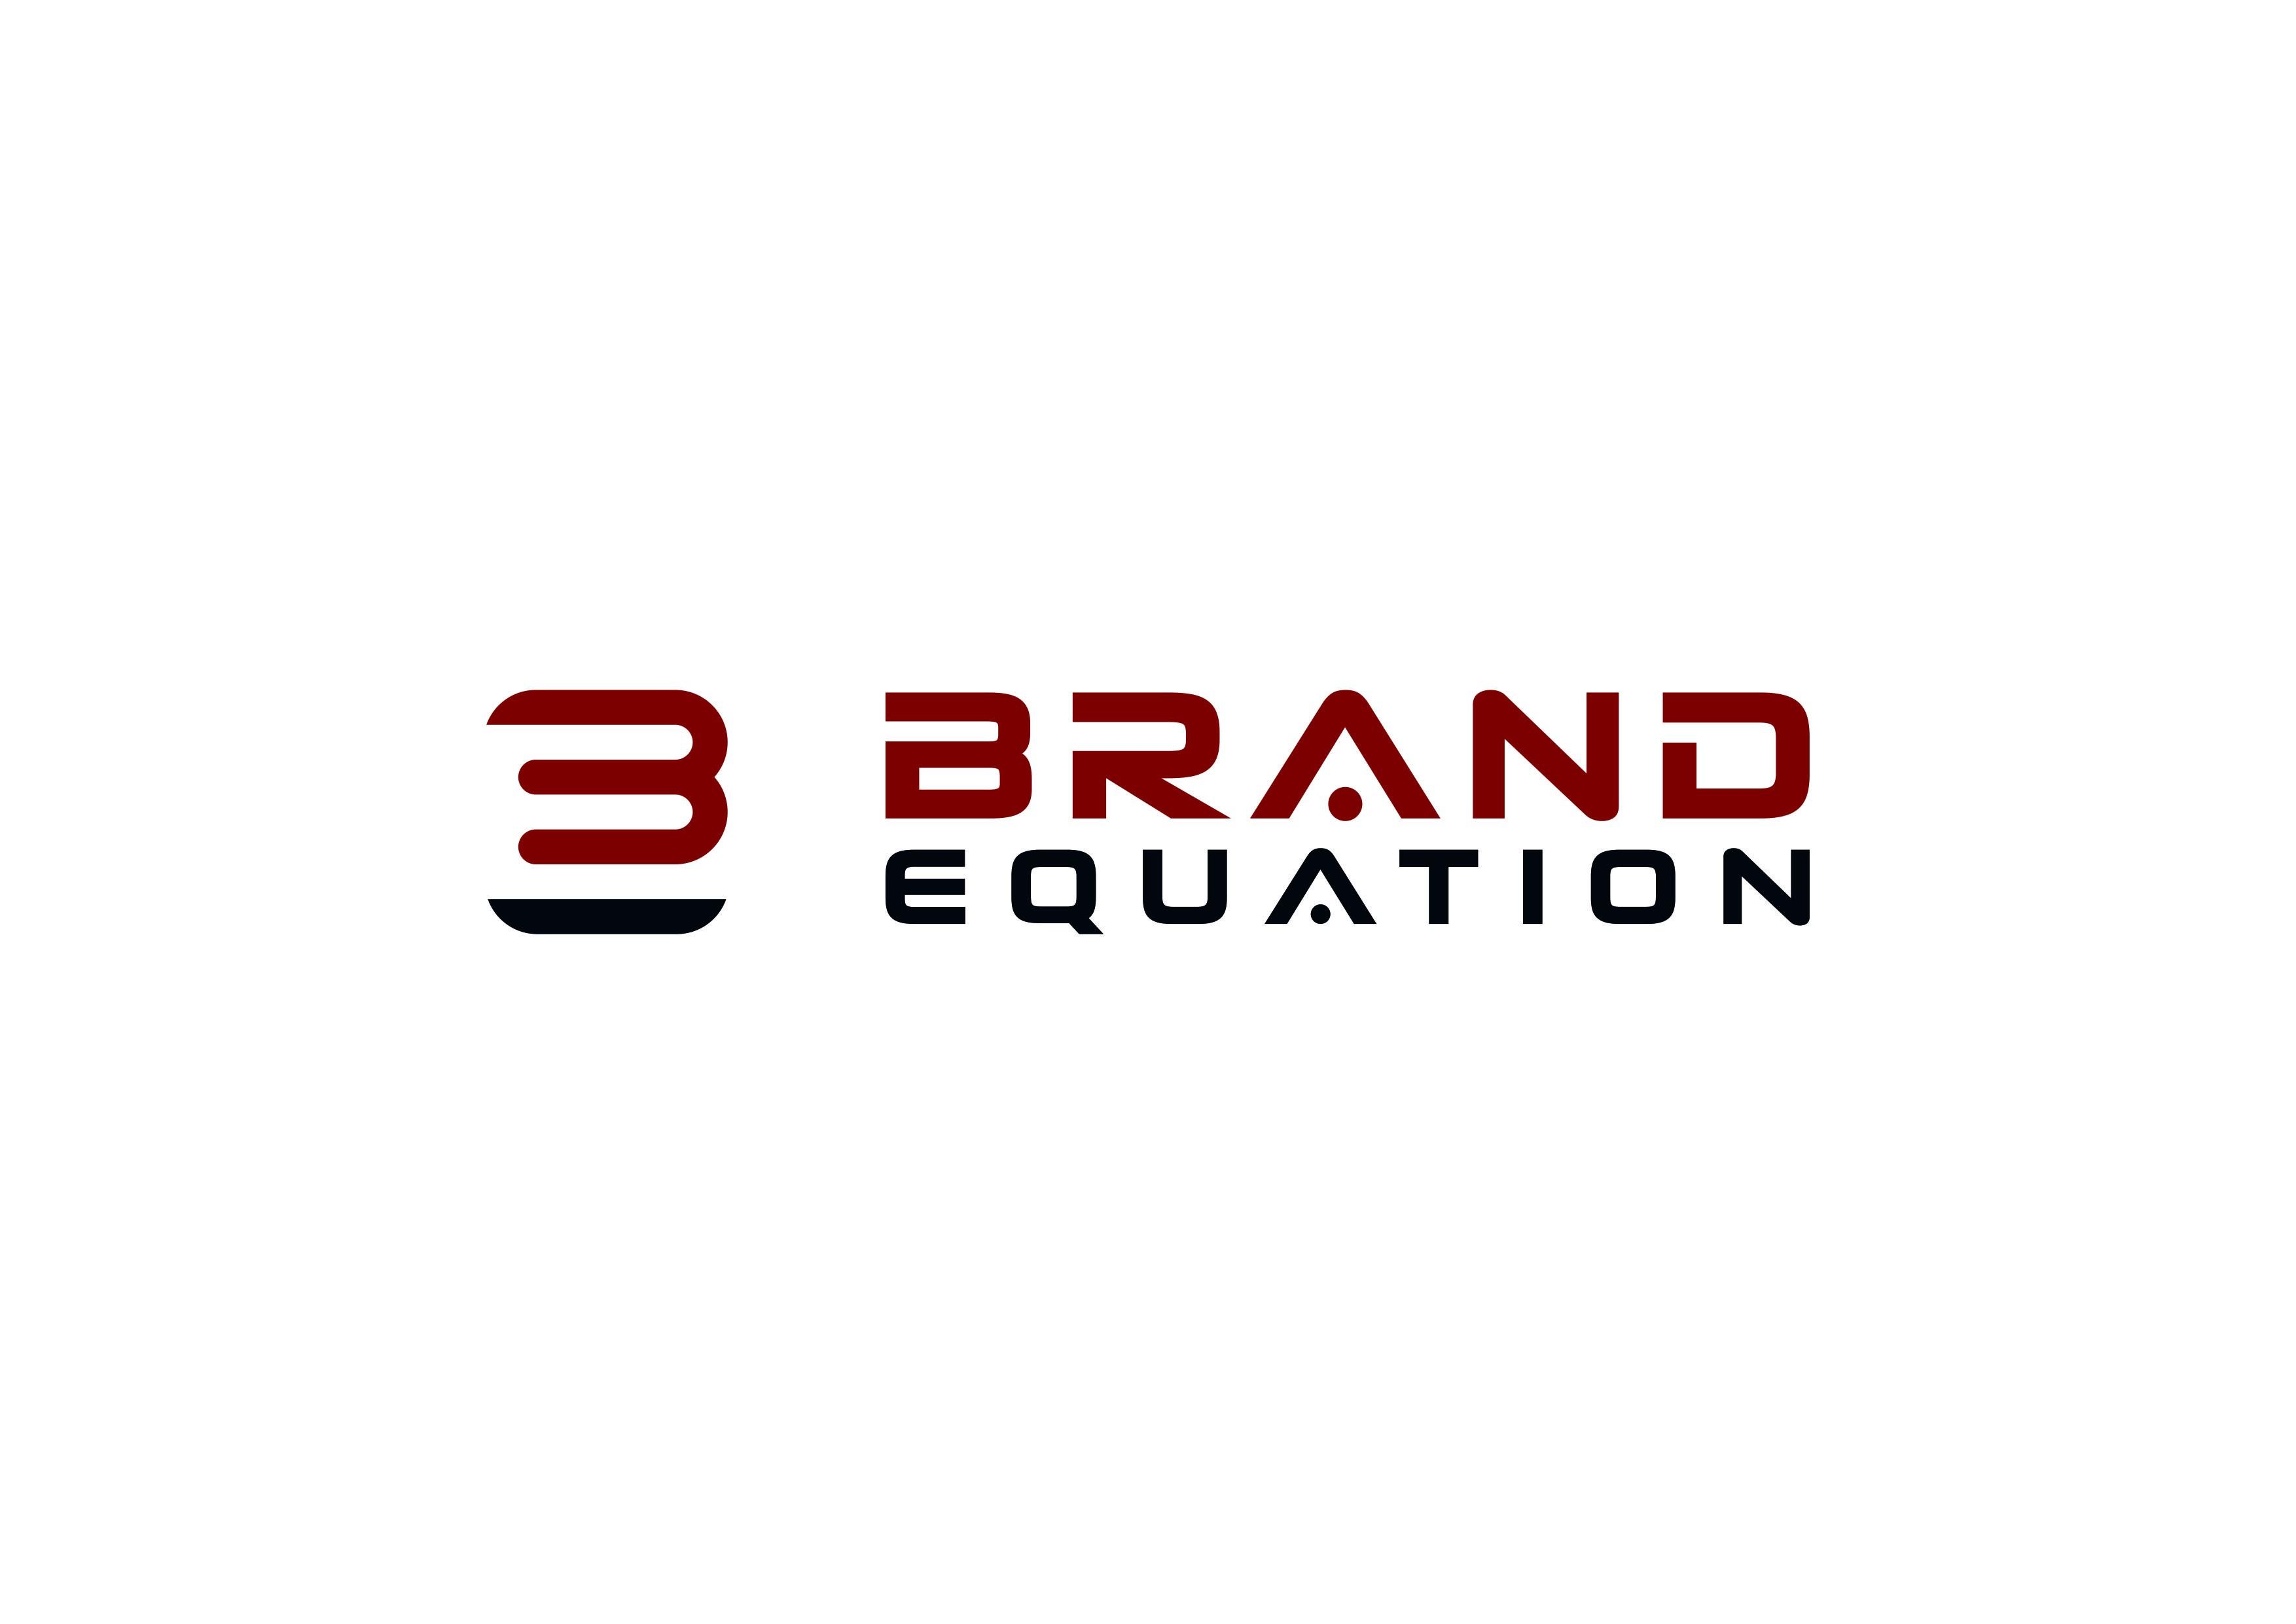 National Marketing Agency Needs New Logo!